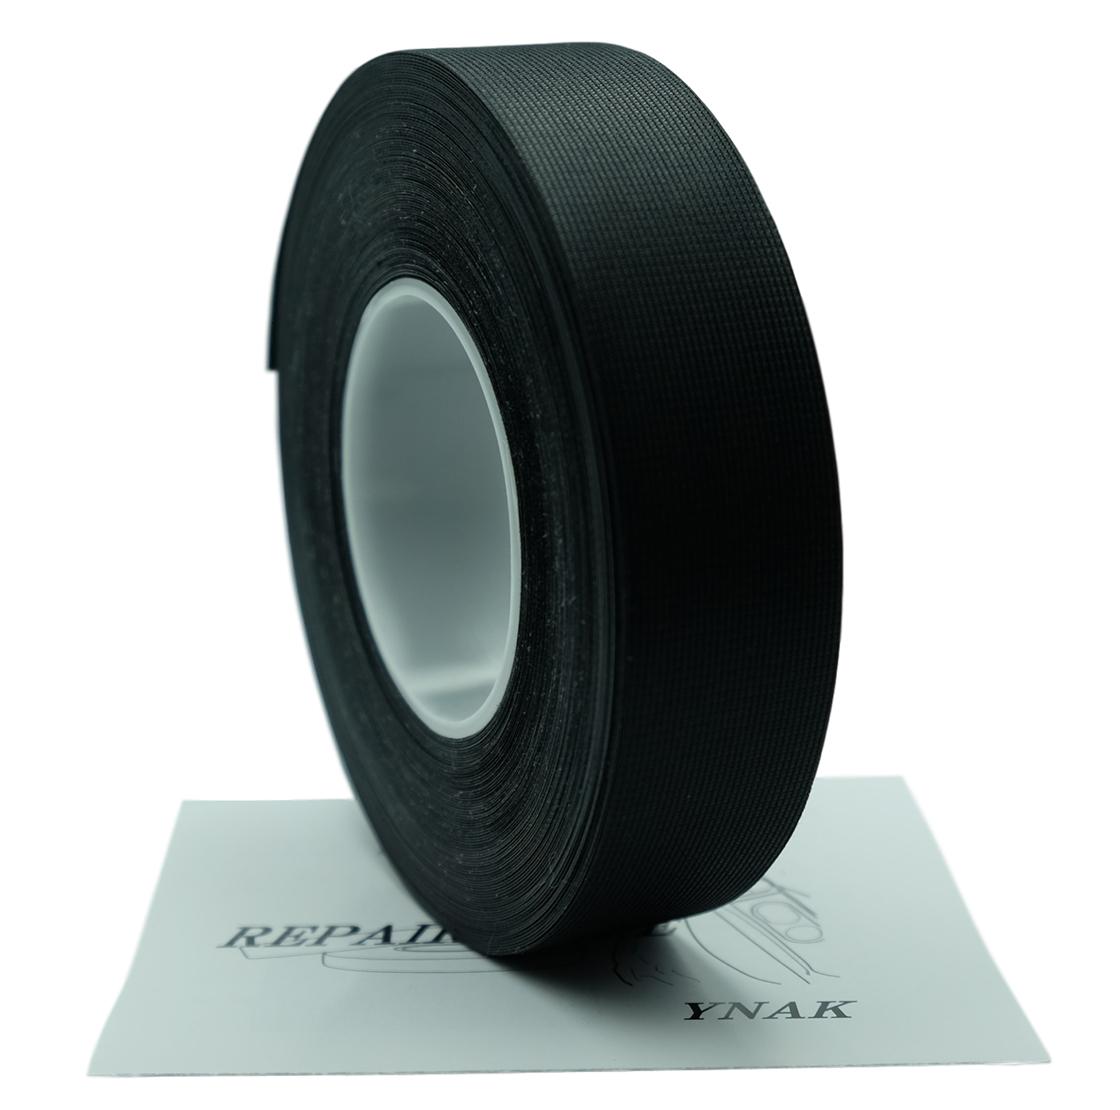 YNAK テント ザック タープ シート レインウェアー 補修 メンテナンス 用 強力 トリコット 表面布状 アイロン式 3レイヤー適合 説明書付き シームテープ (ブラック,幅25mm×20m)